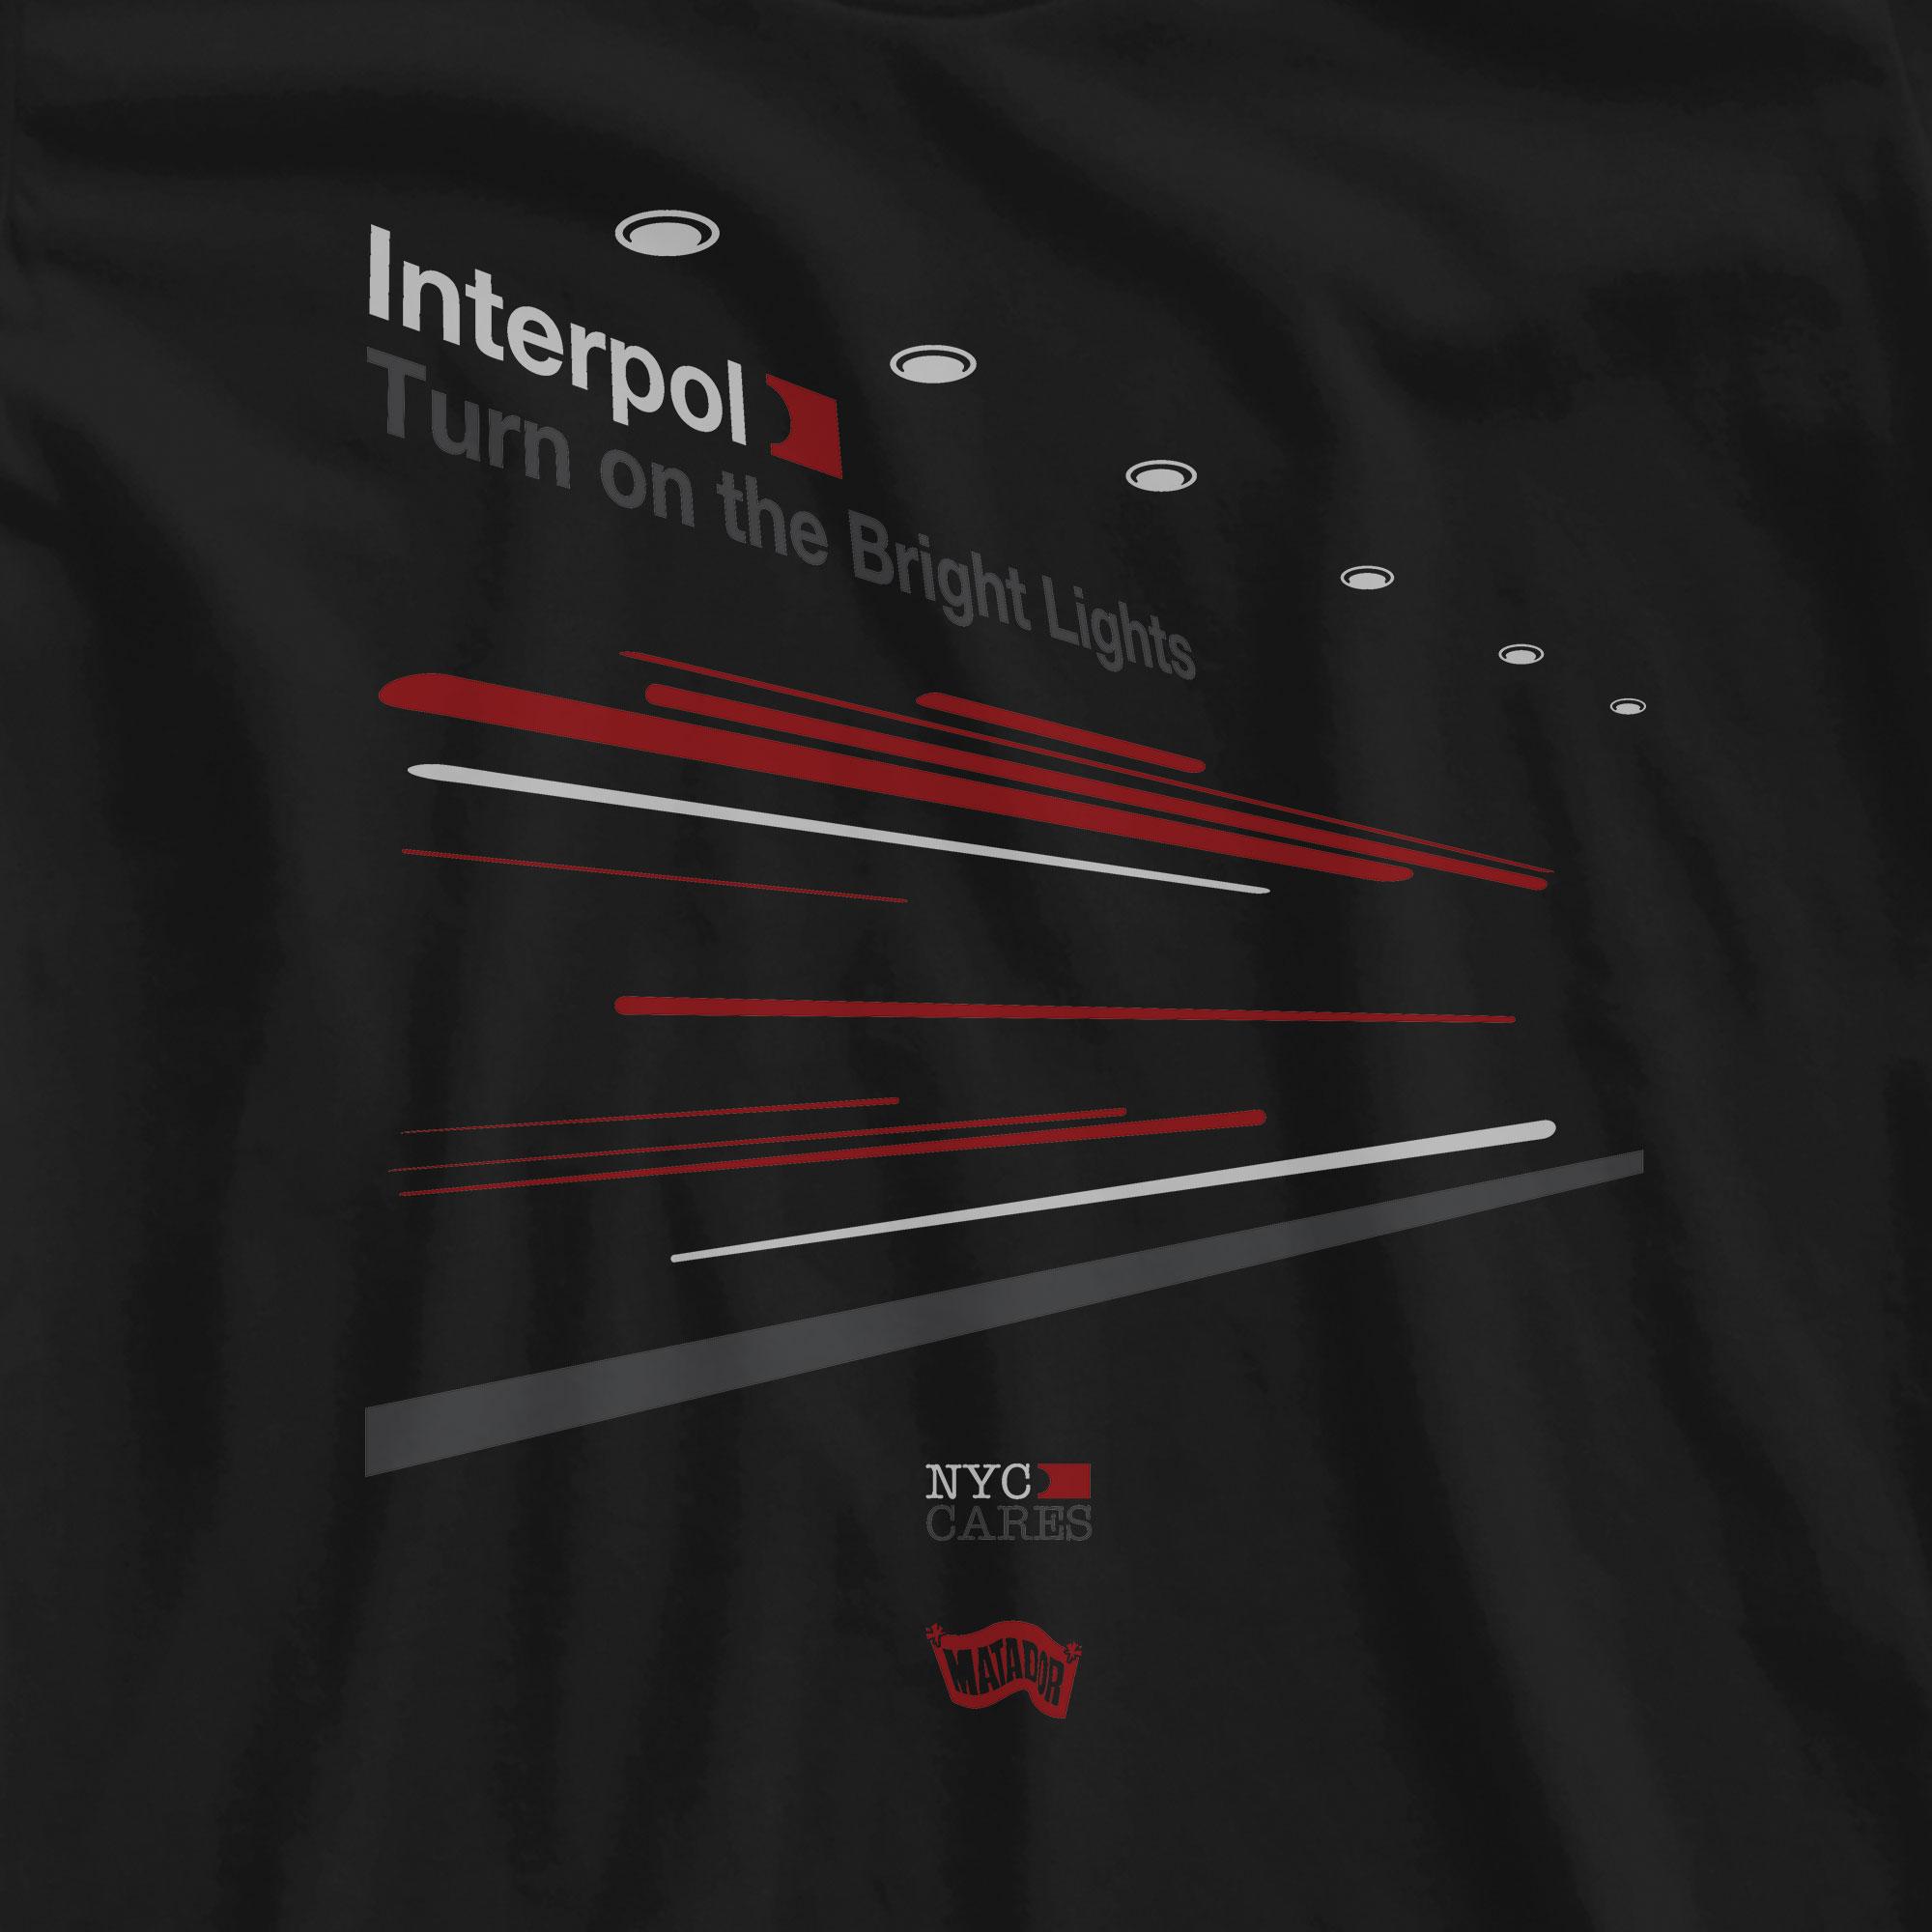 Camiseta Turn On The Bright Lights 3 - Interpol - Feminino